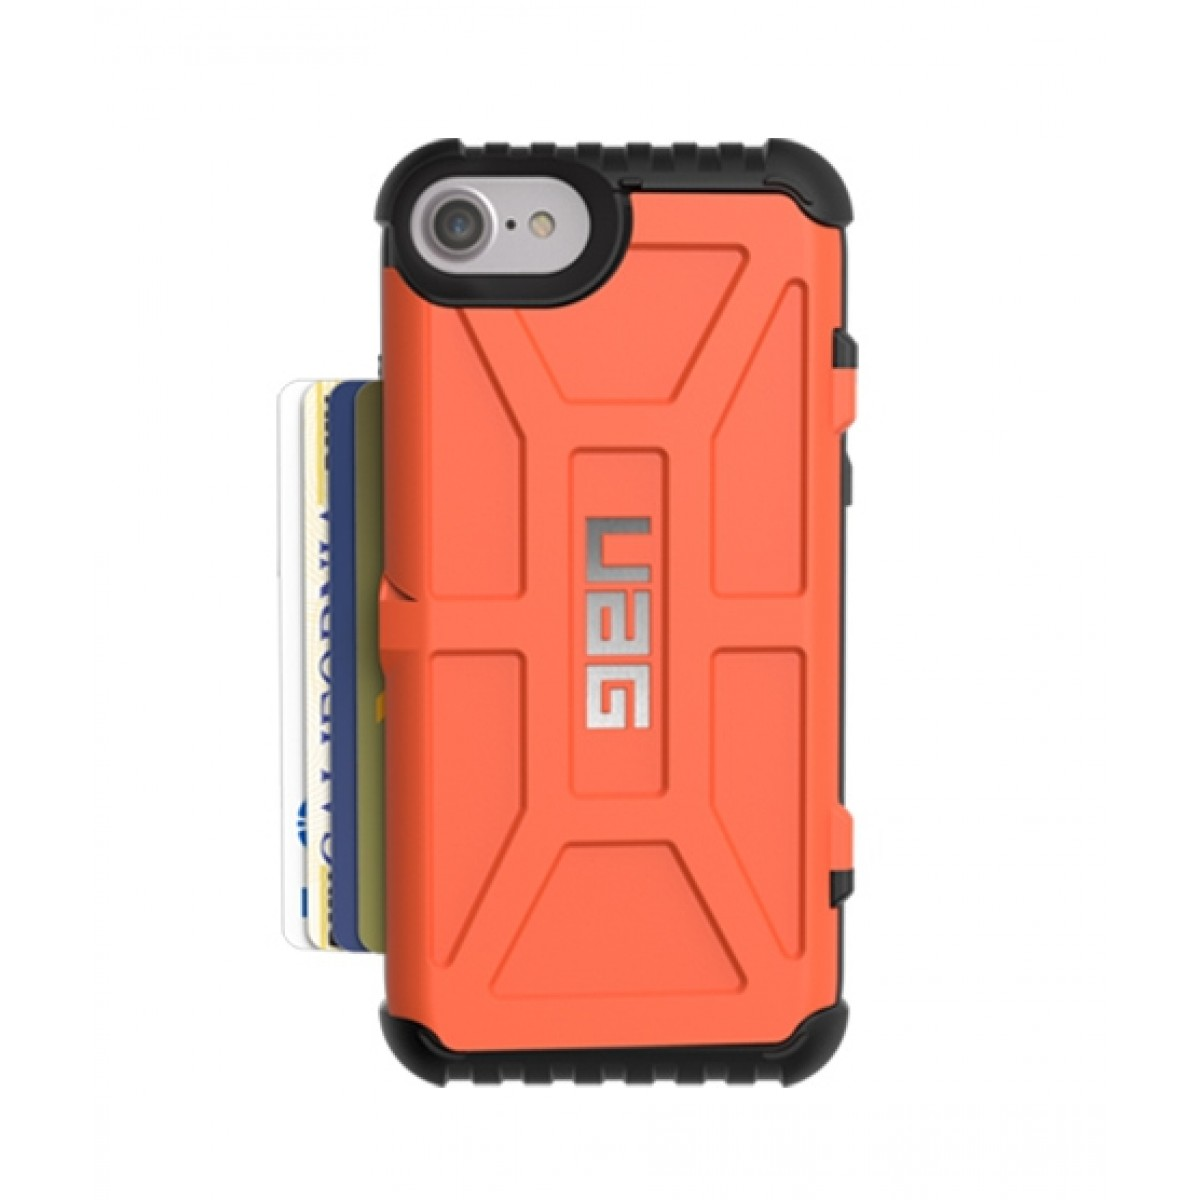 quality design fe6f3 2f3c7 UAG Trooper Series Rust Case For iPhone 8